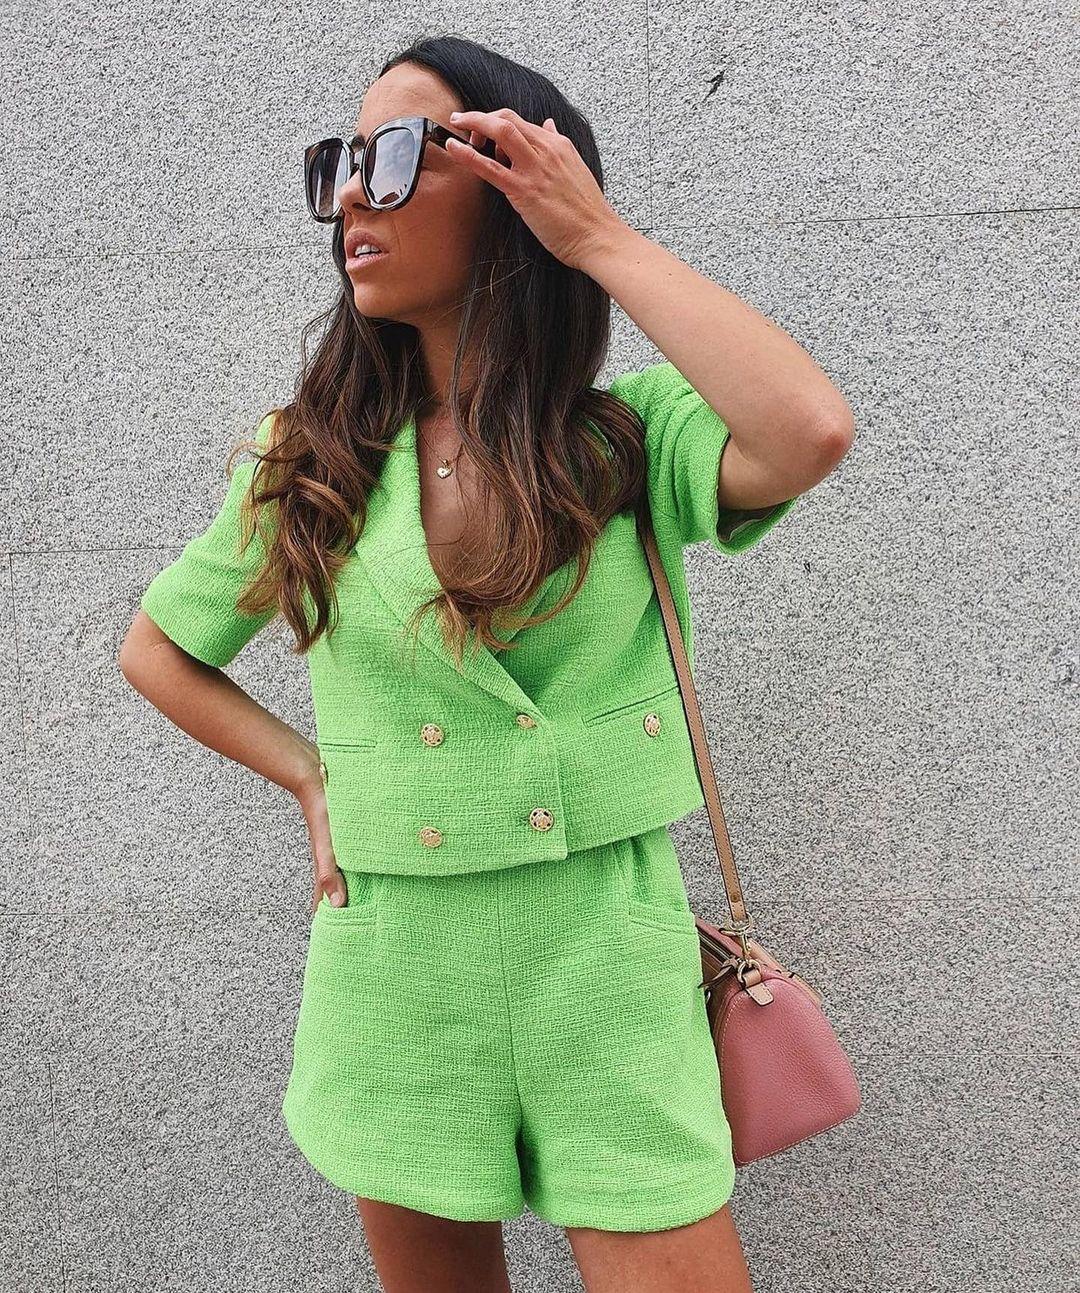 structured shorts with buttons de Zara sur zaradiccion__